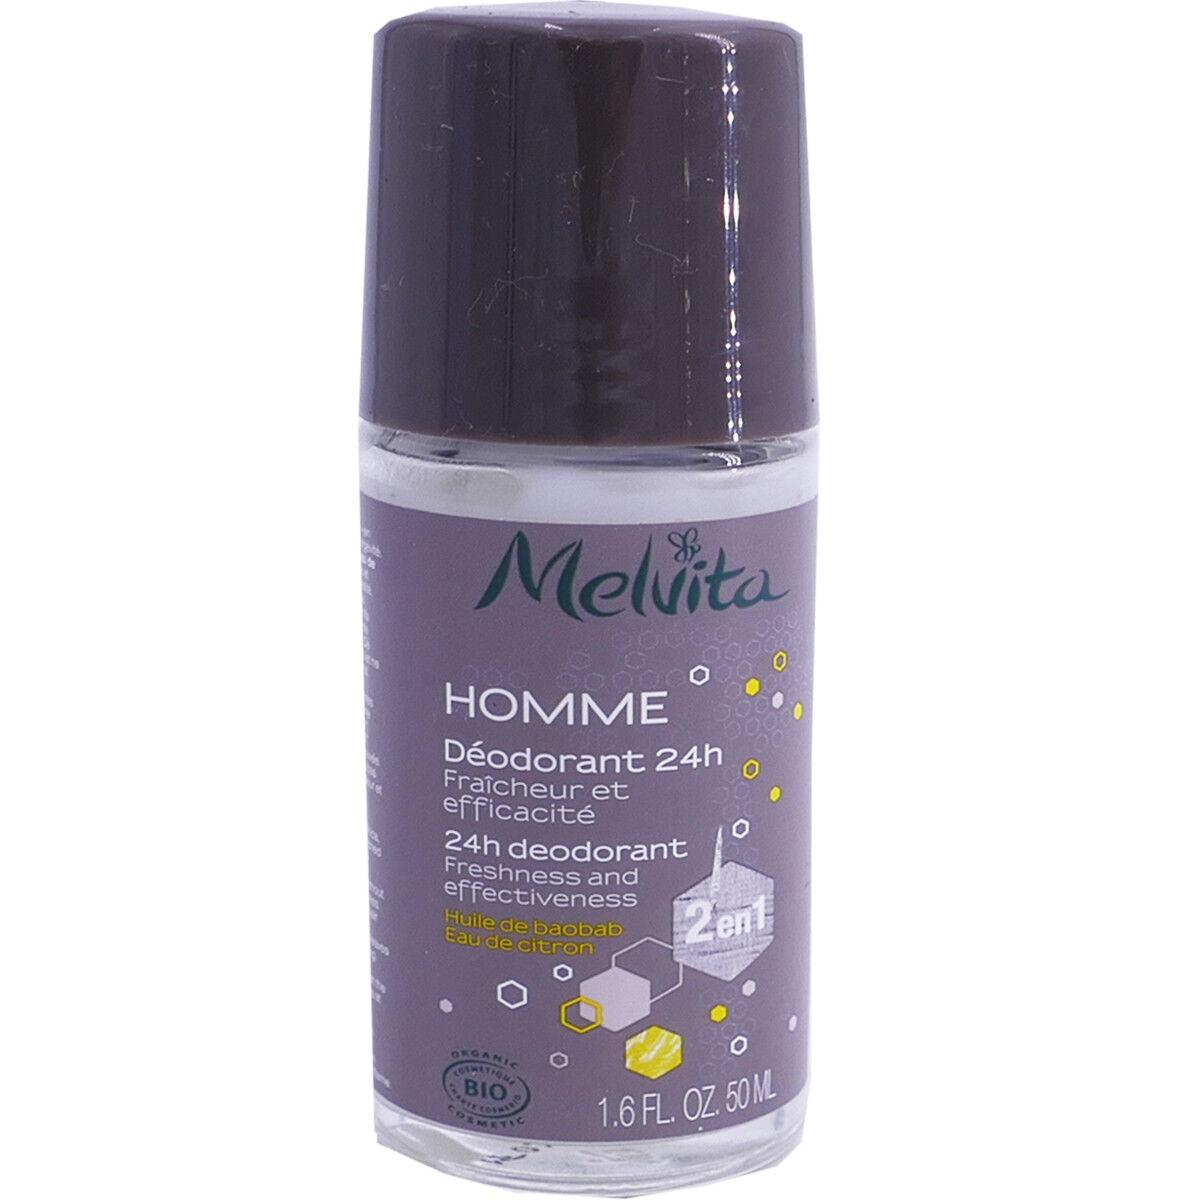 Melvita homme deodorant 24h 50 ml